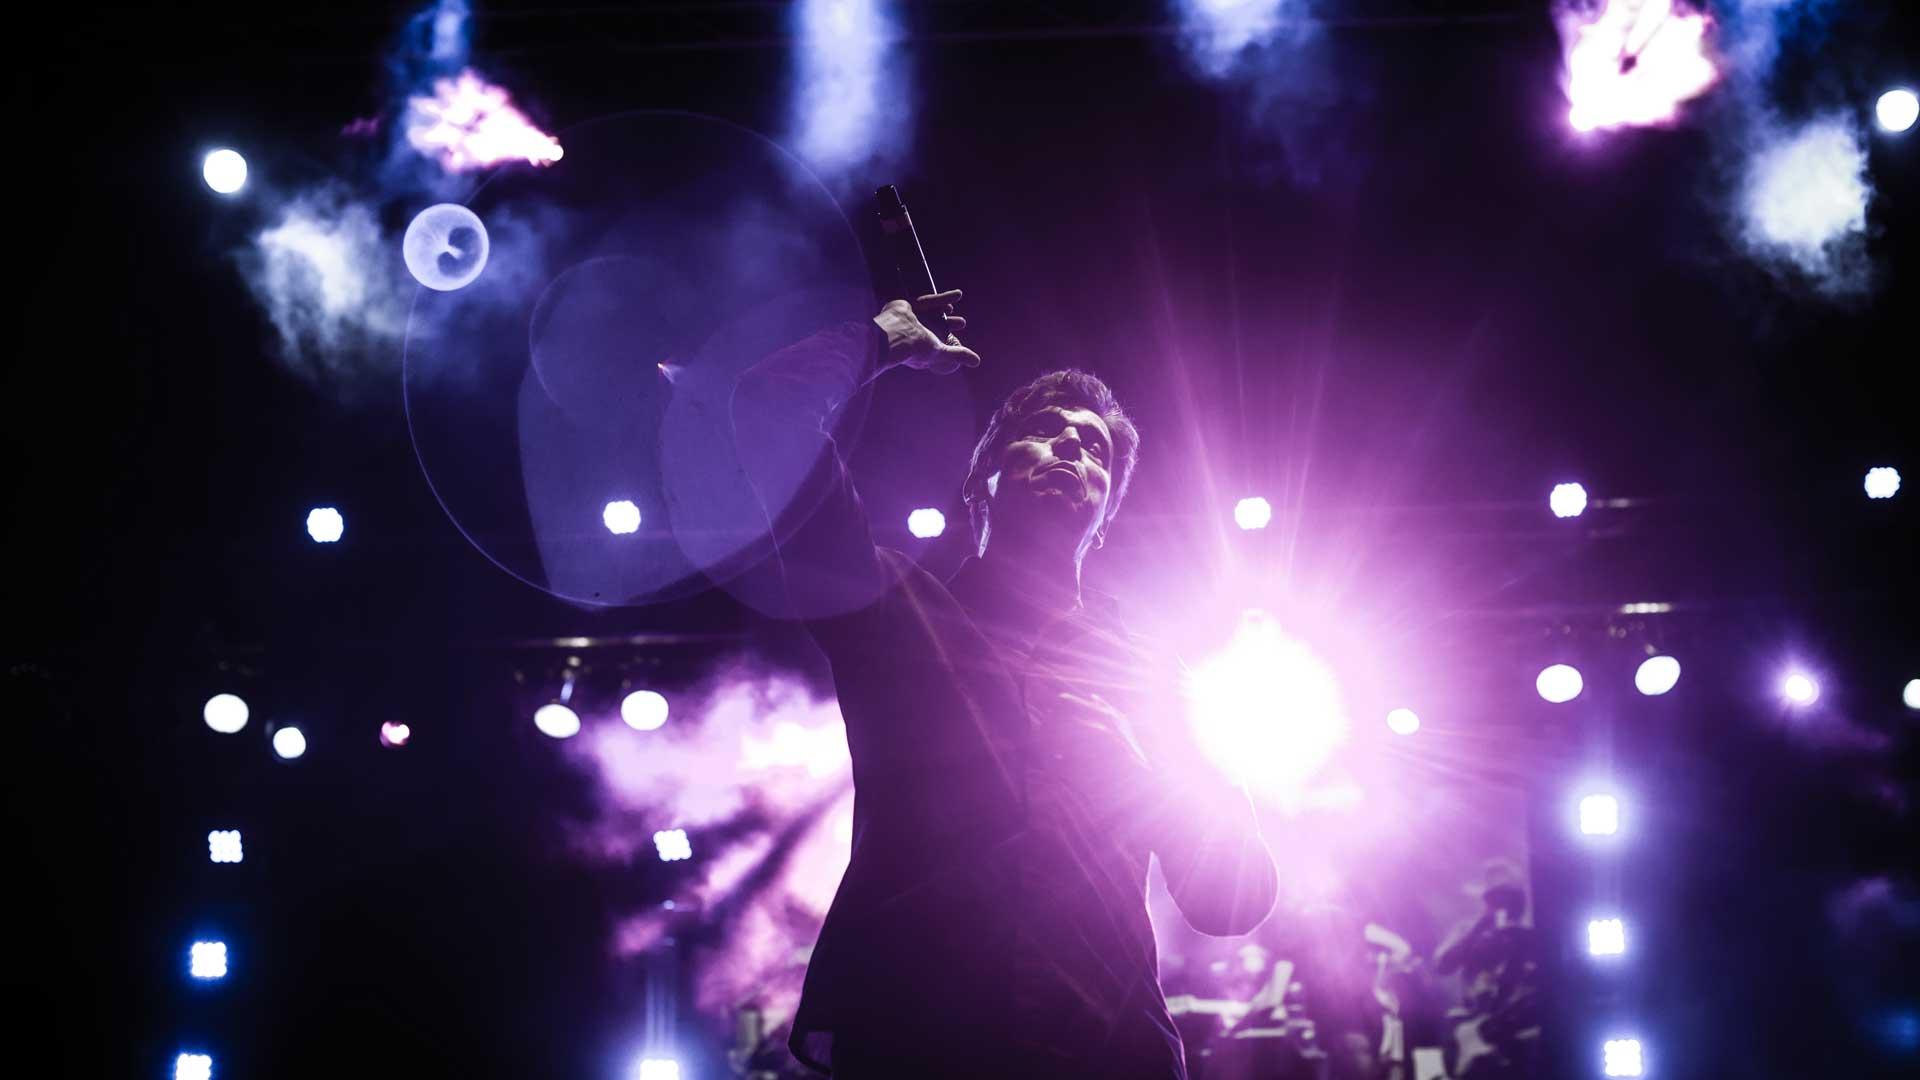 starfest80-17 Spots & Eventos Corporativos - video boda cadiz